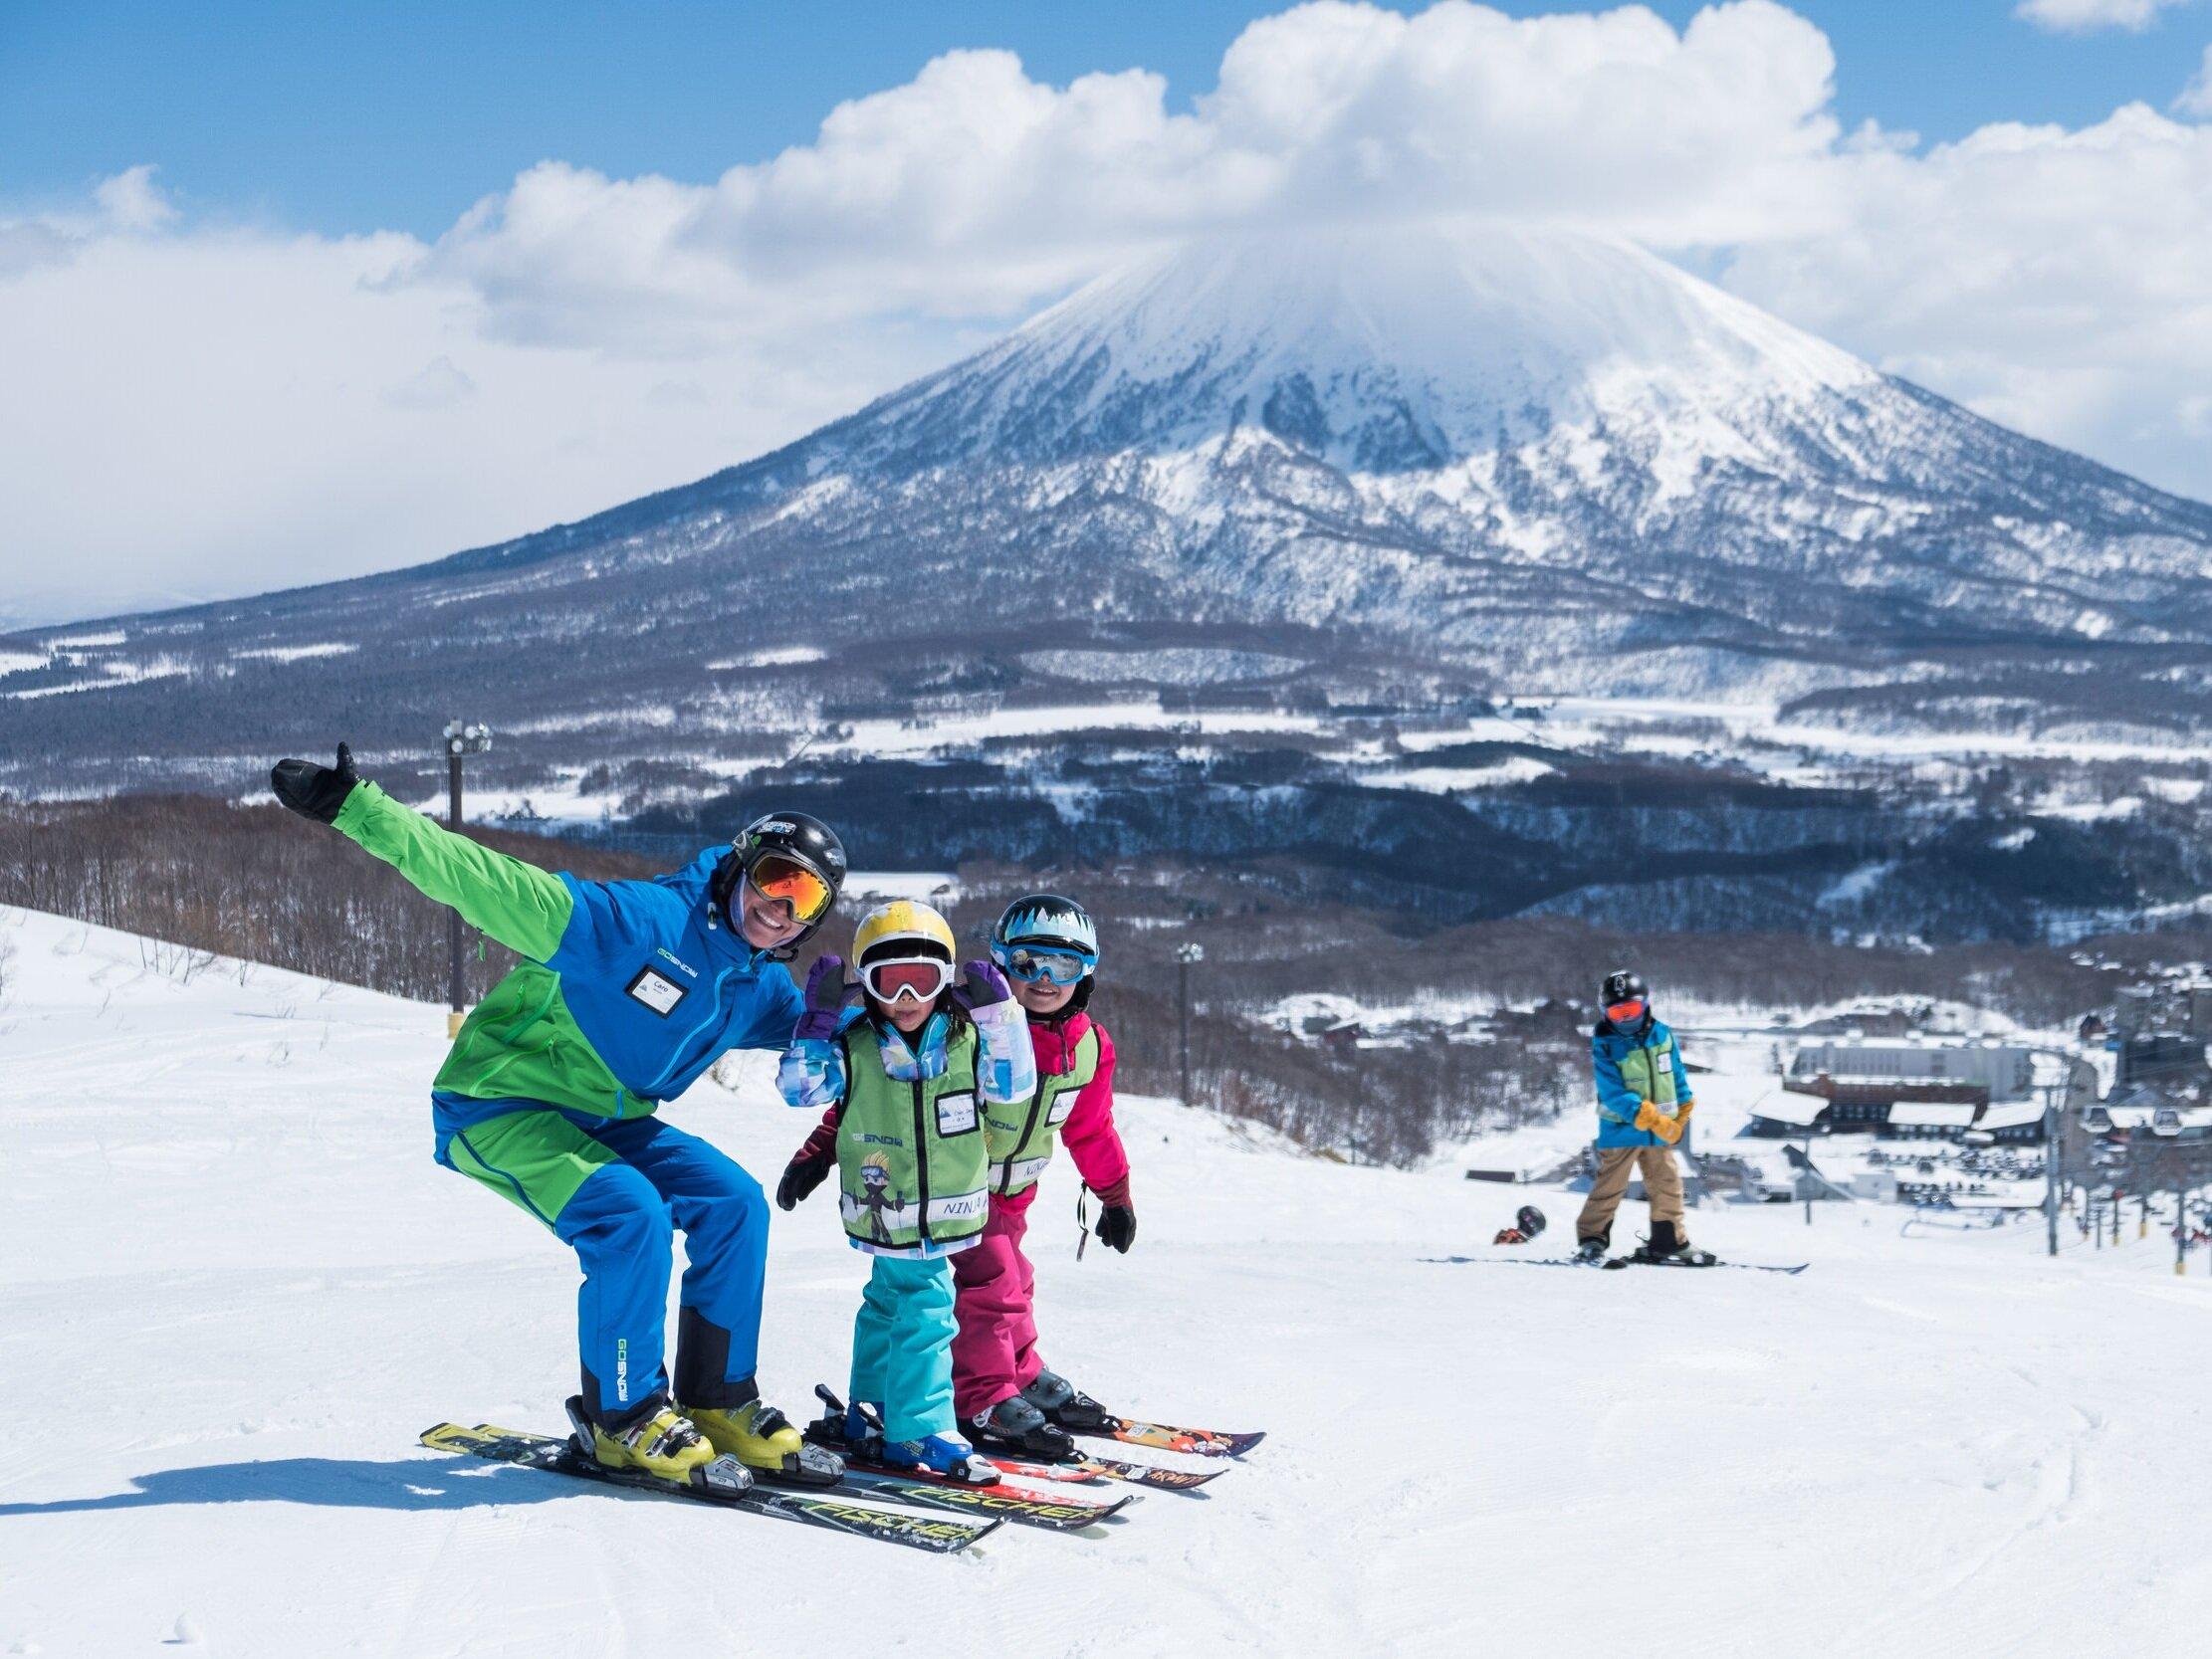 Mabey+Ski_Japan_Niseko_GoSnow+2019+Ninja+Kids+%282%29.jpg